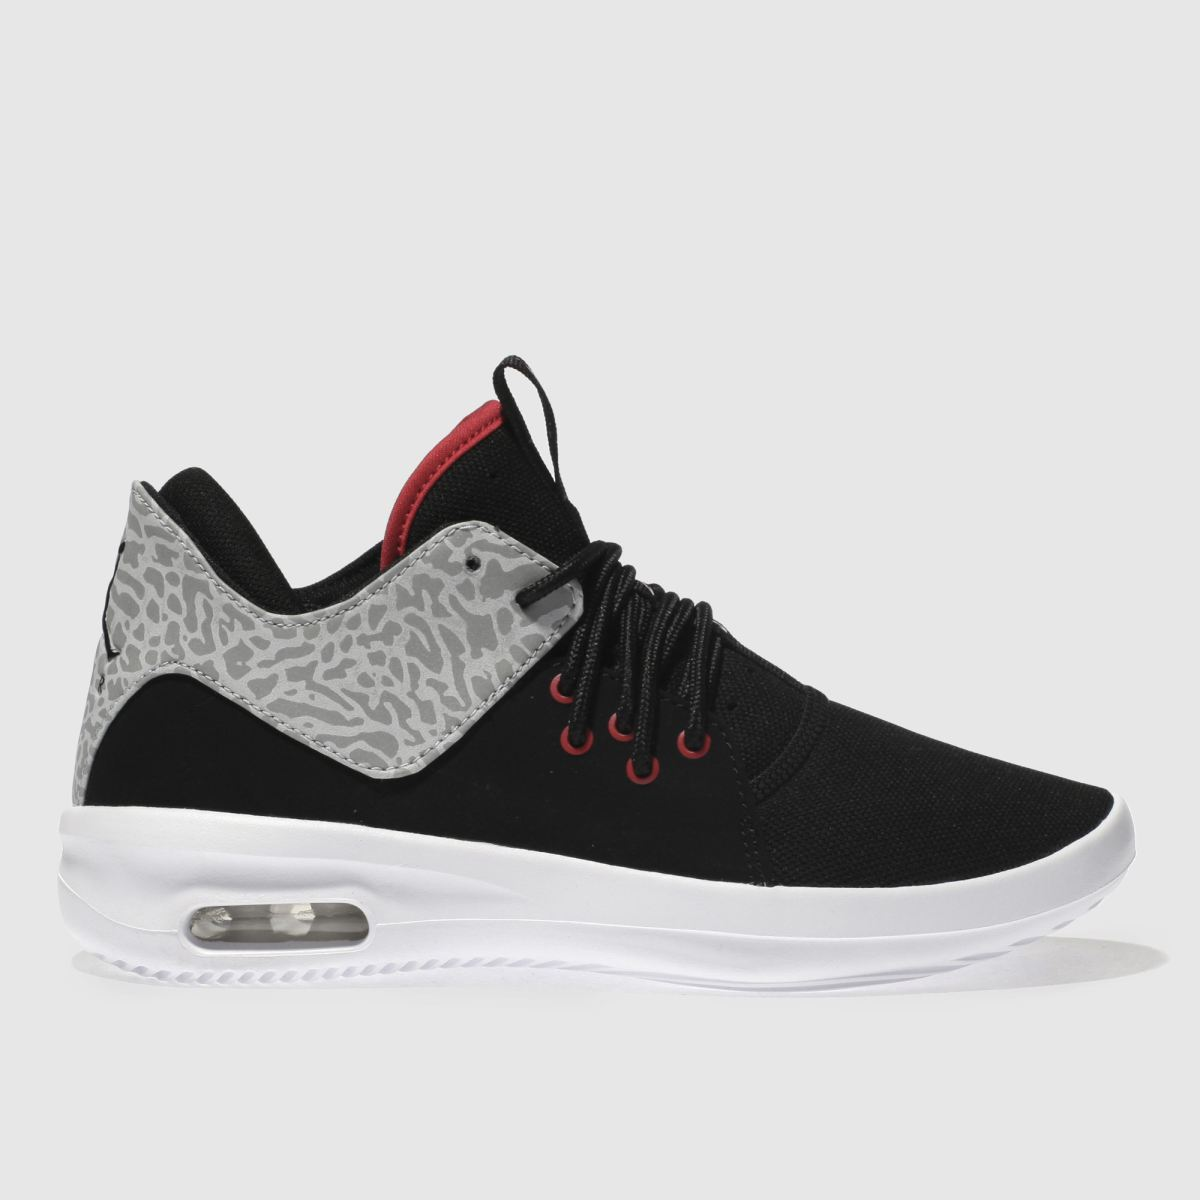 Nike Jordan Black & Grey First Class Youth Trainers